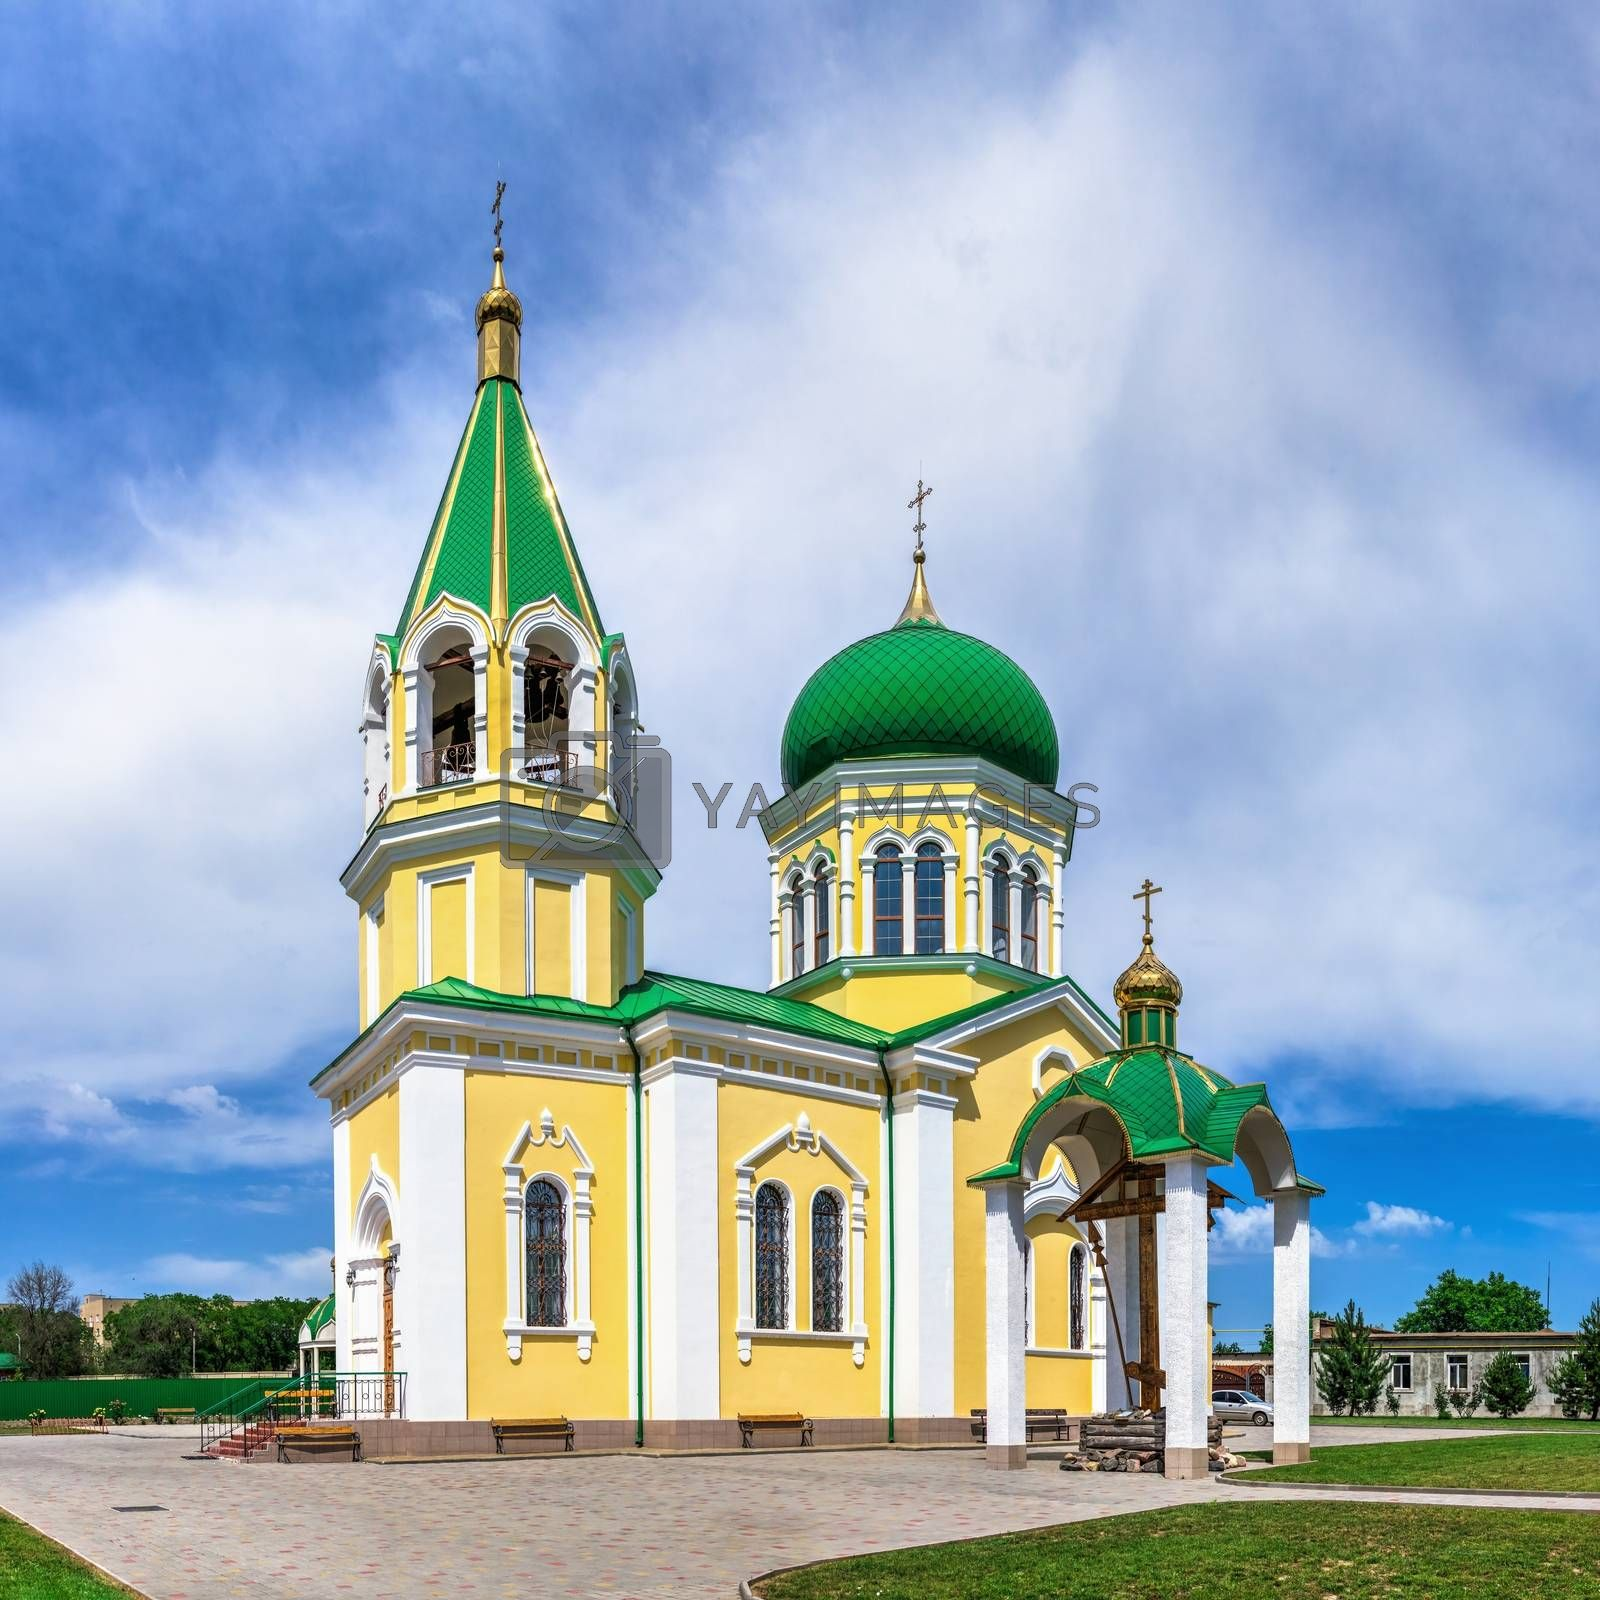 Izmail, Ukraine 06.07.2020. St Nicholas Church in Izmail, Ukraine, on a sunny summer day